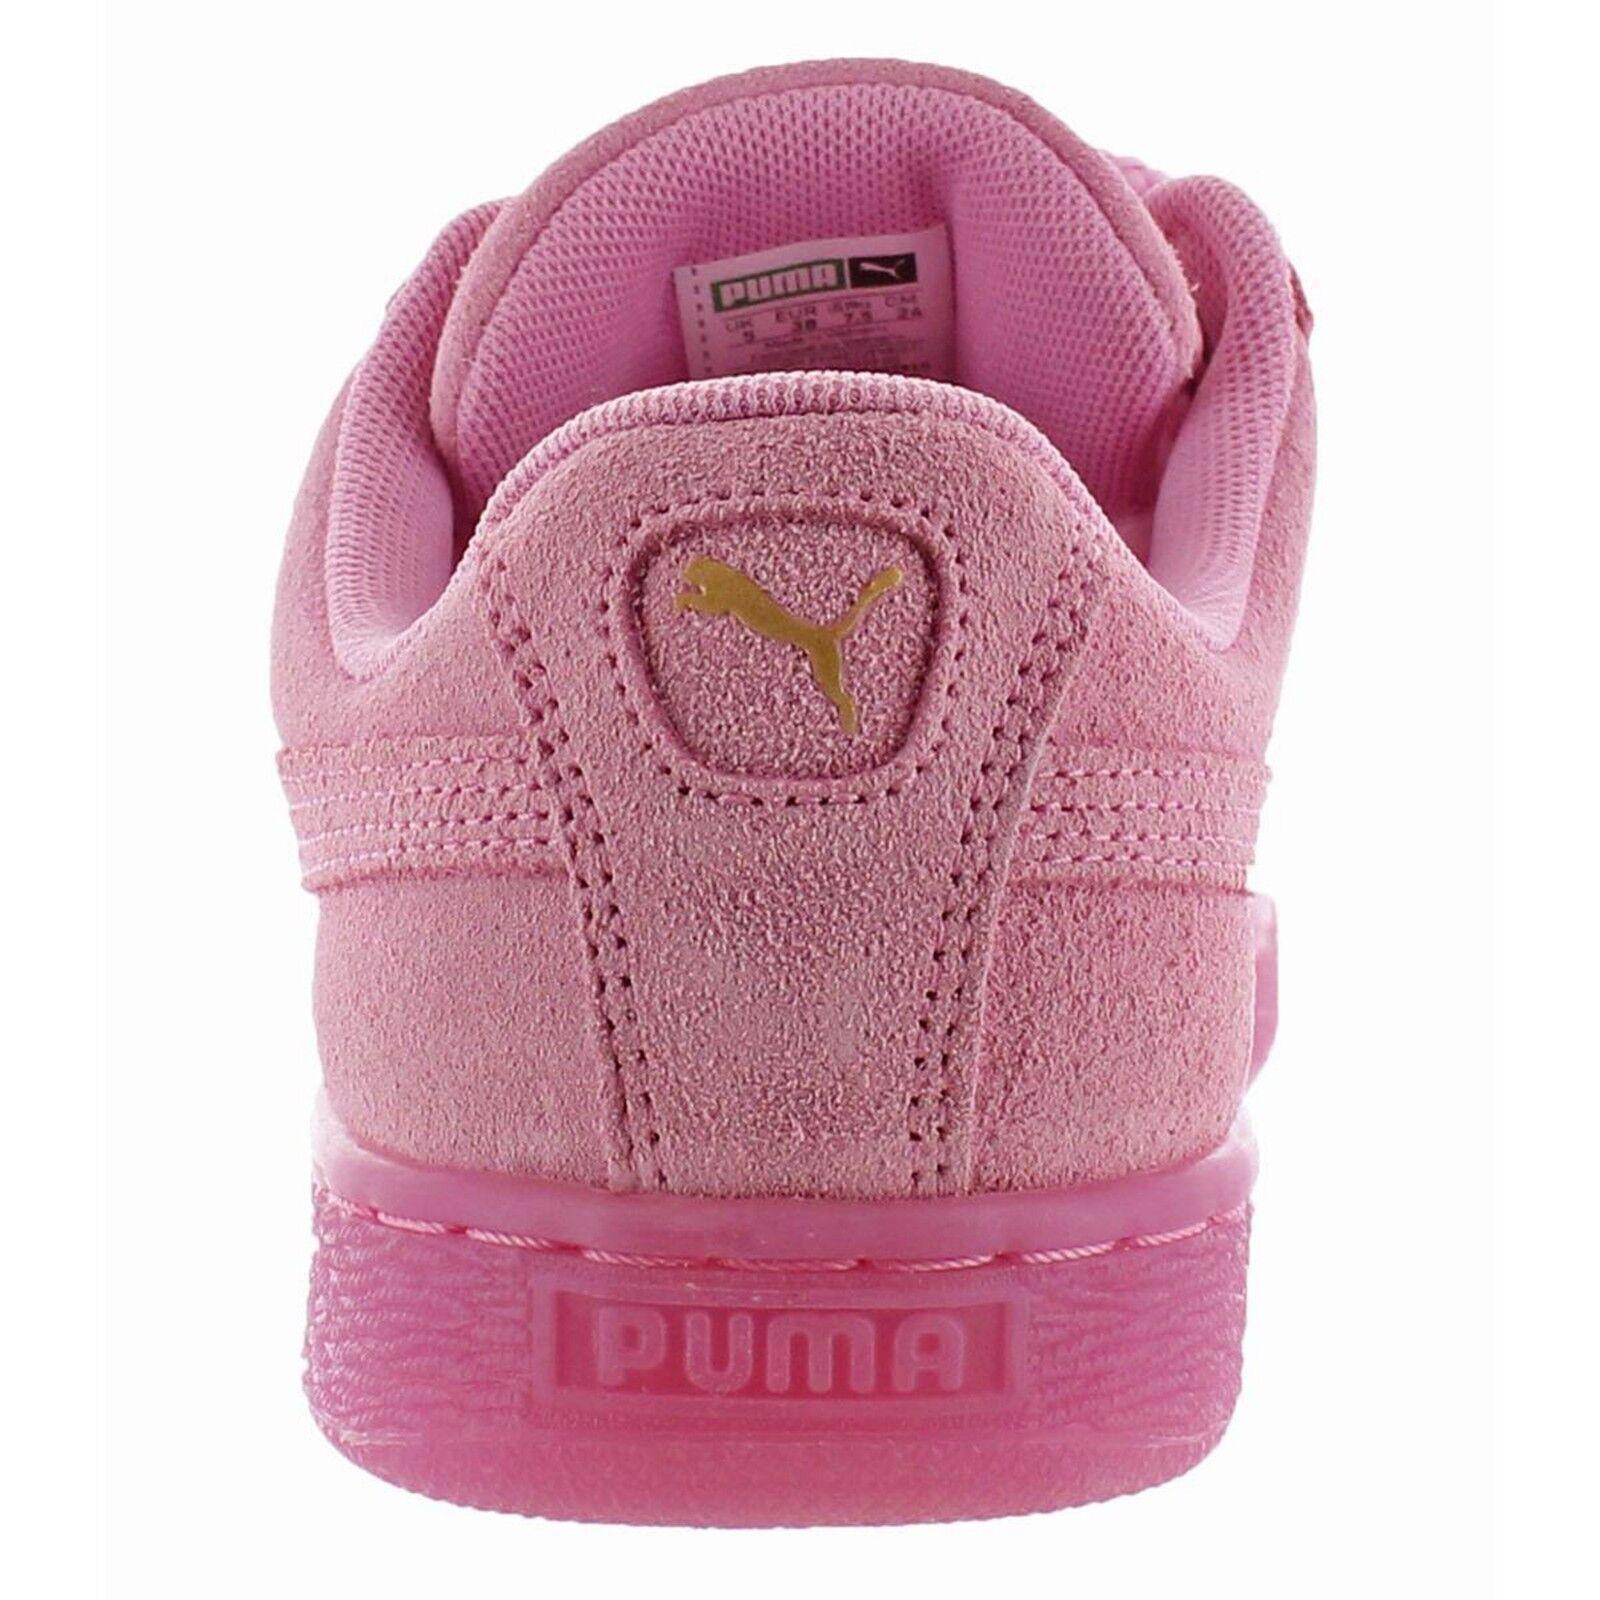 NEU PUMA Damen Wildleder Leder Rosa Bogen 95 Fashion Sneaker Turnschue 38,5 95 Bogen b67c3c